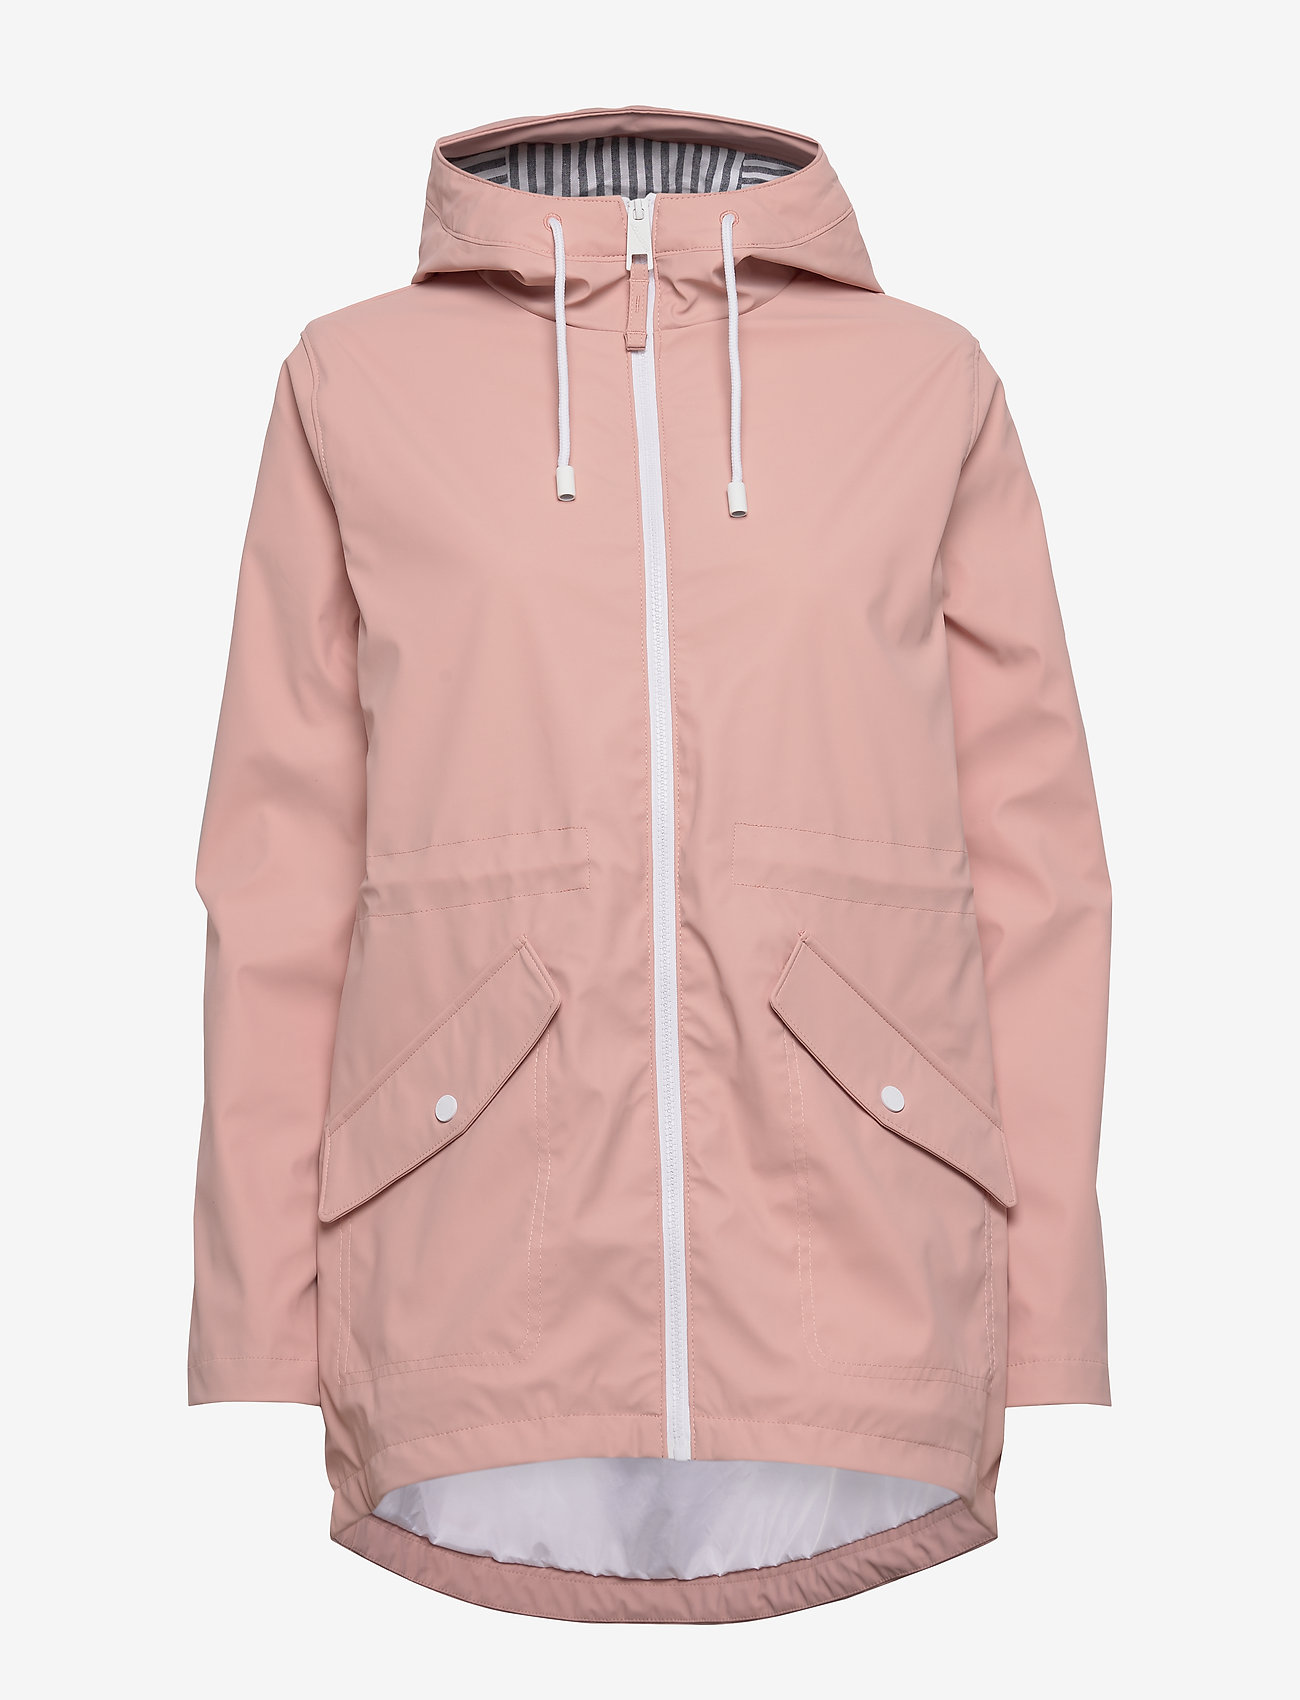 Hollister Blush Rain Jacket - Jackor & Kappor Light Pink Dd